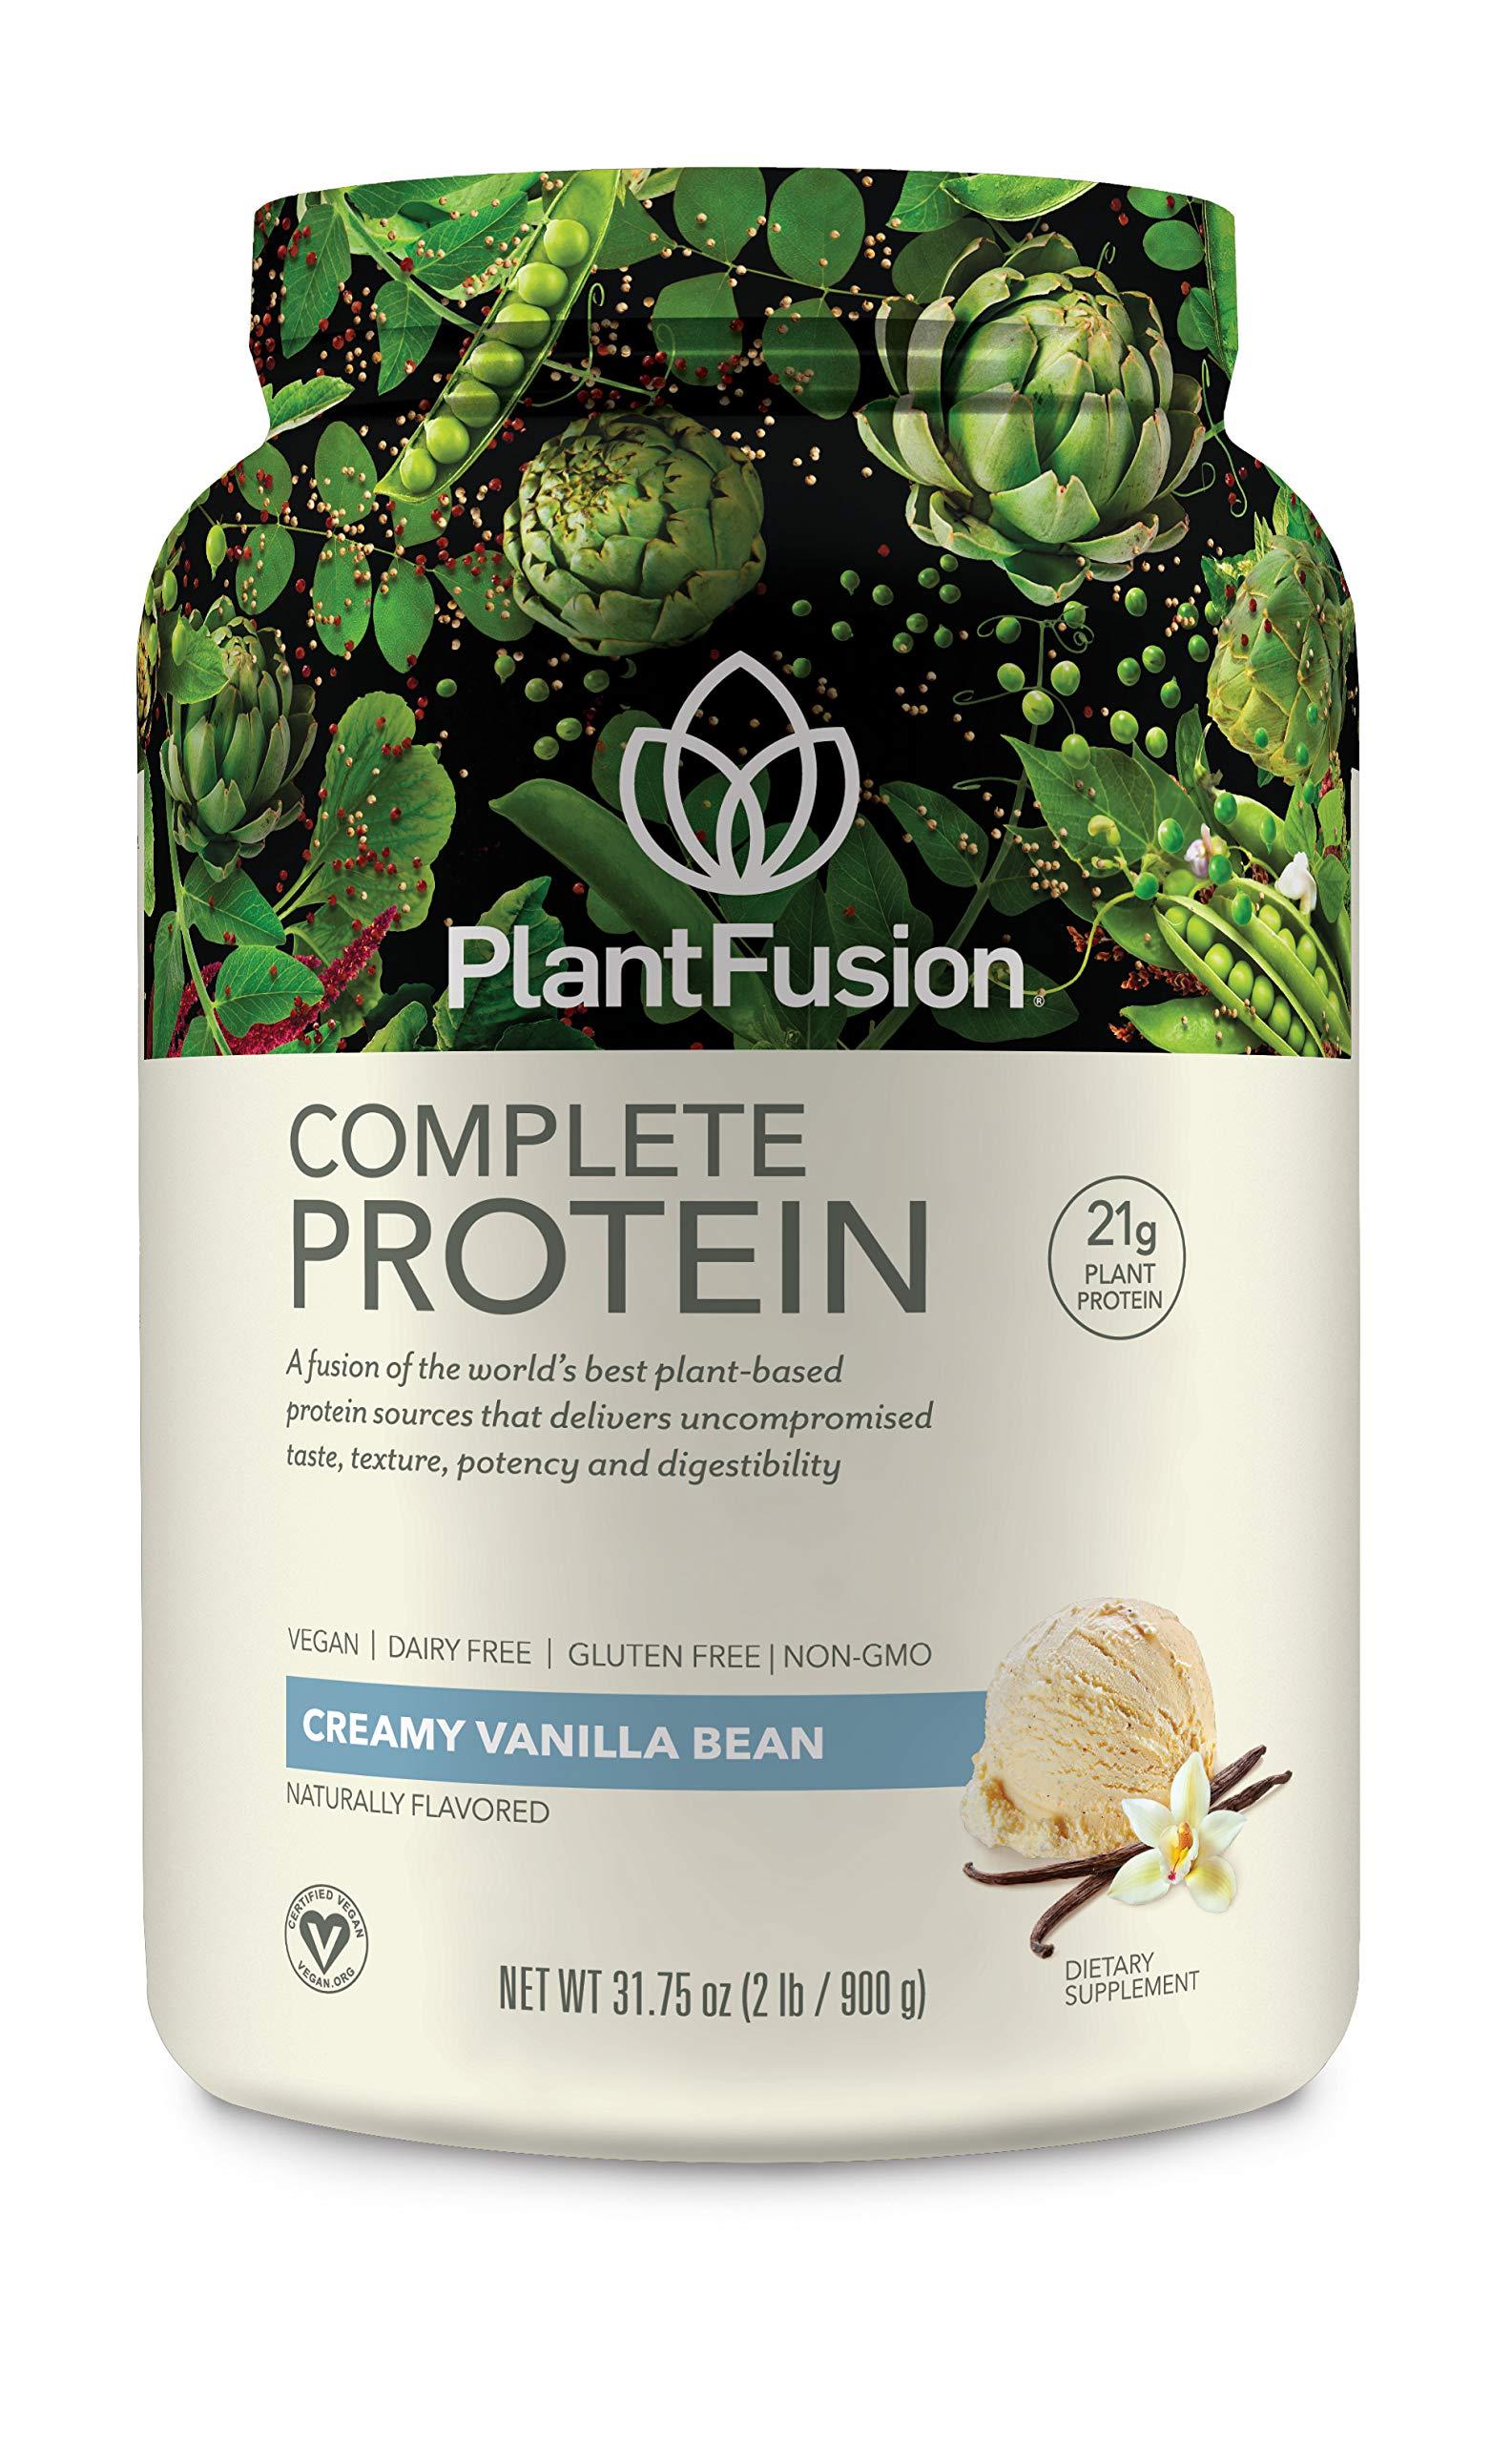 PlantFusion Complete Plant Based Protein Powder, Creamy Vanilla Bean, 2 Lb  Tub, 30